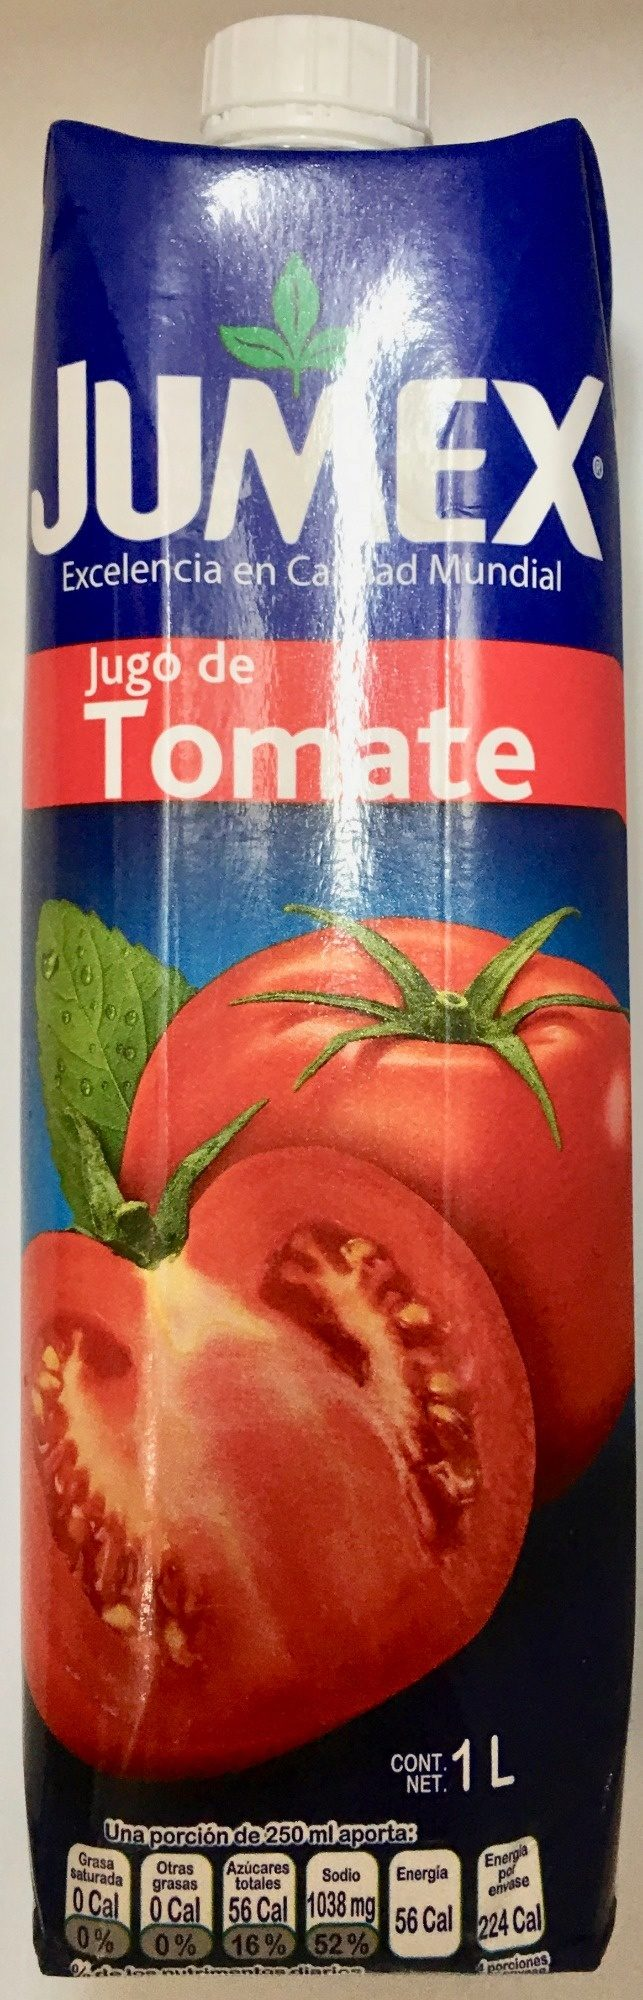 Jumex Tomate - Producto - es